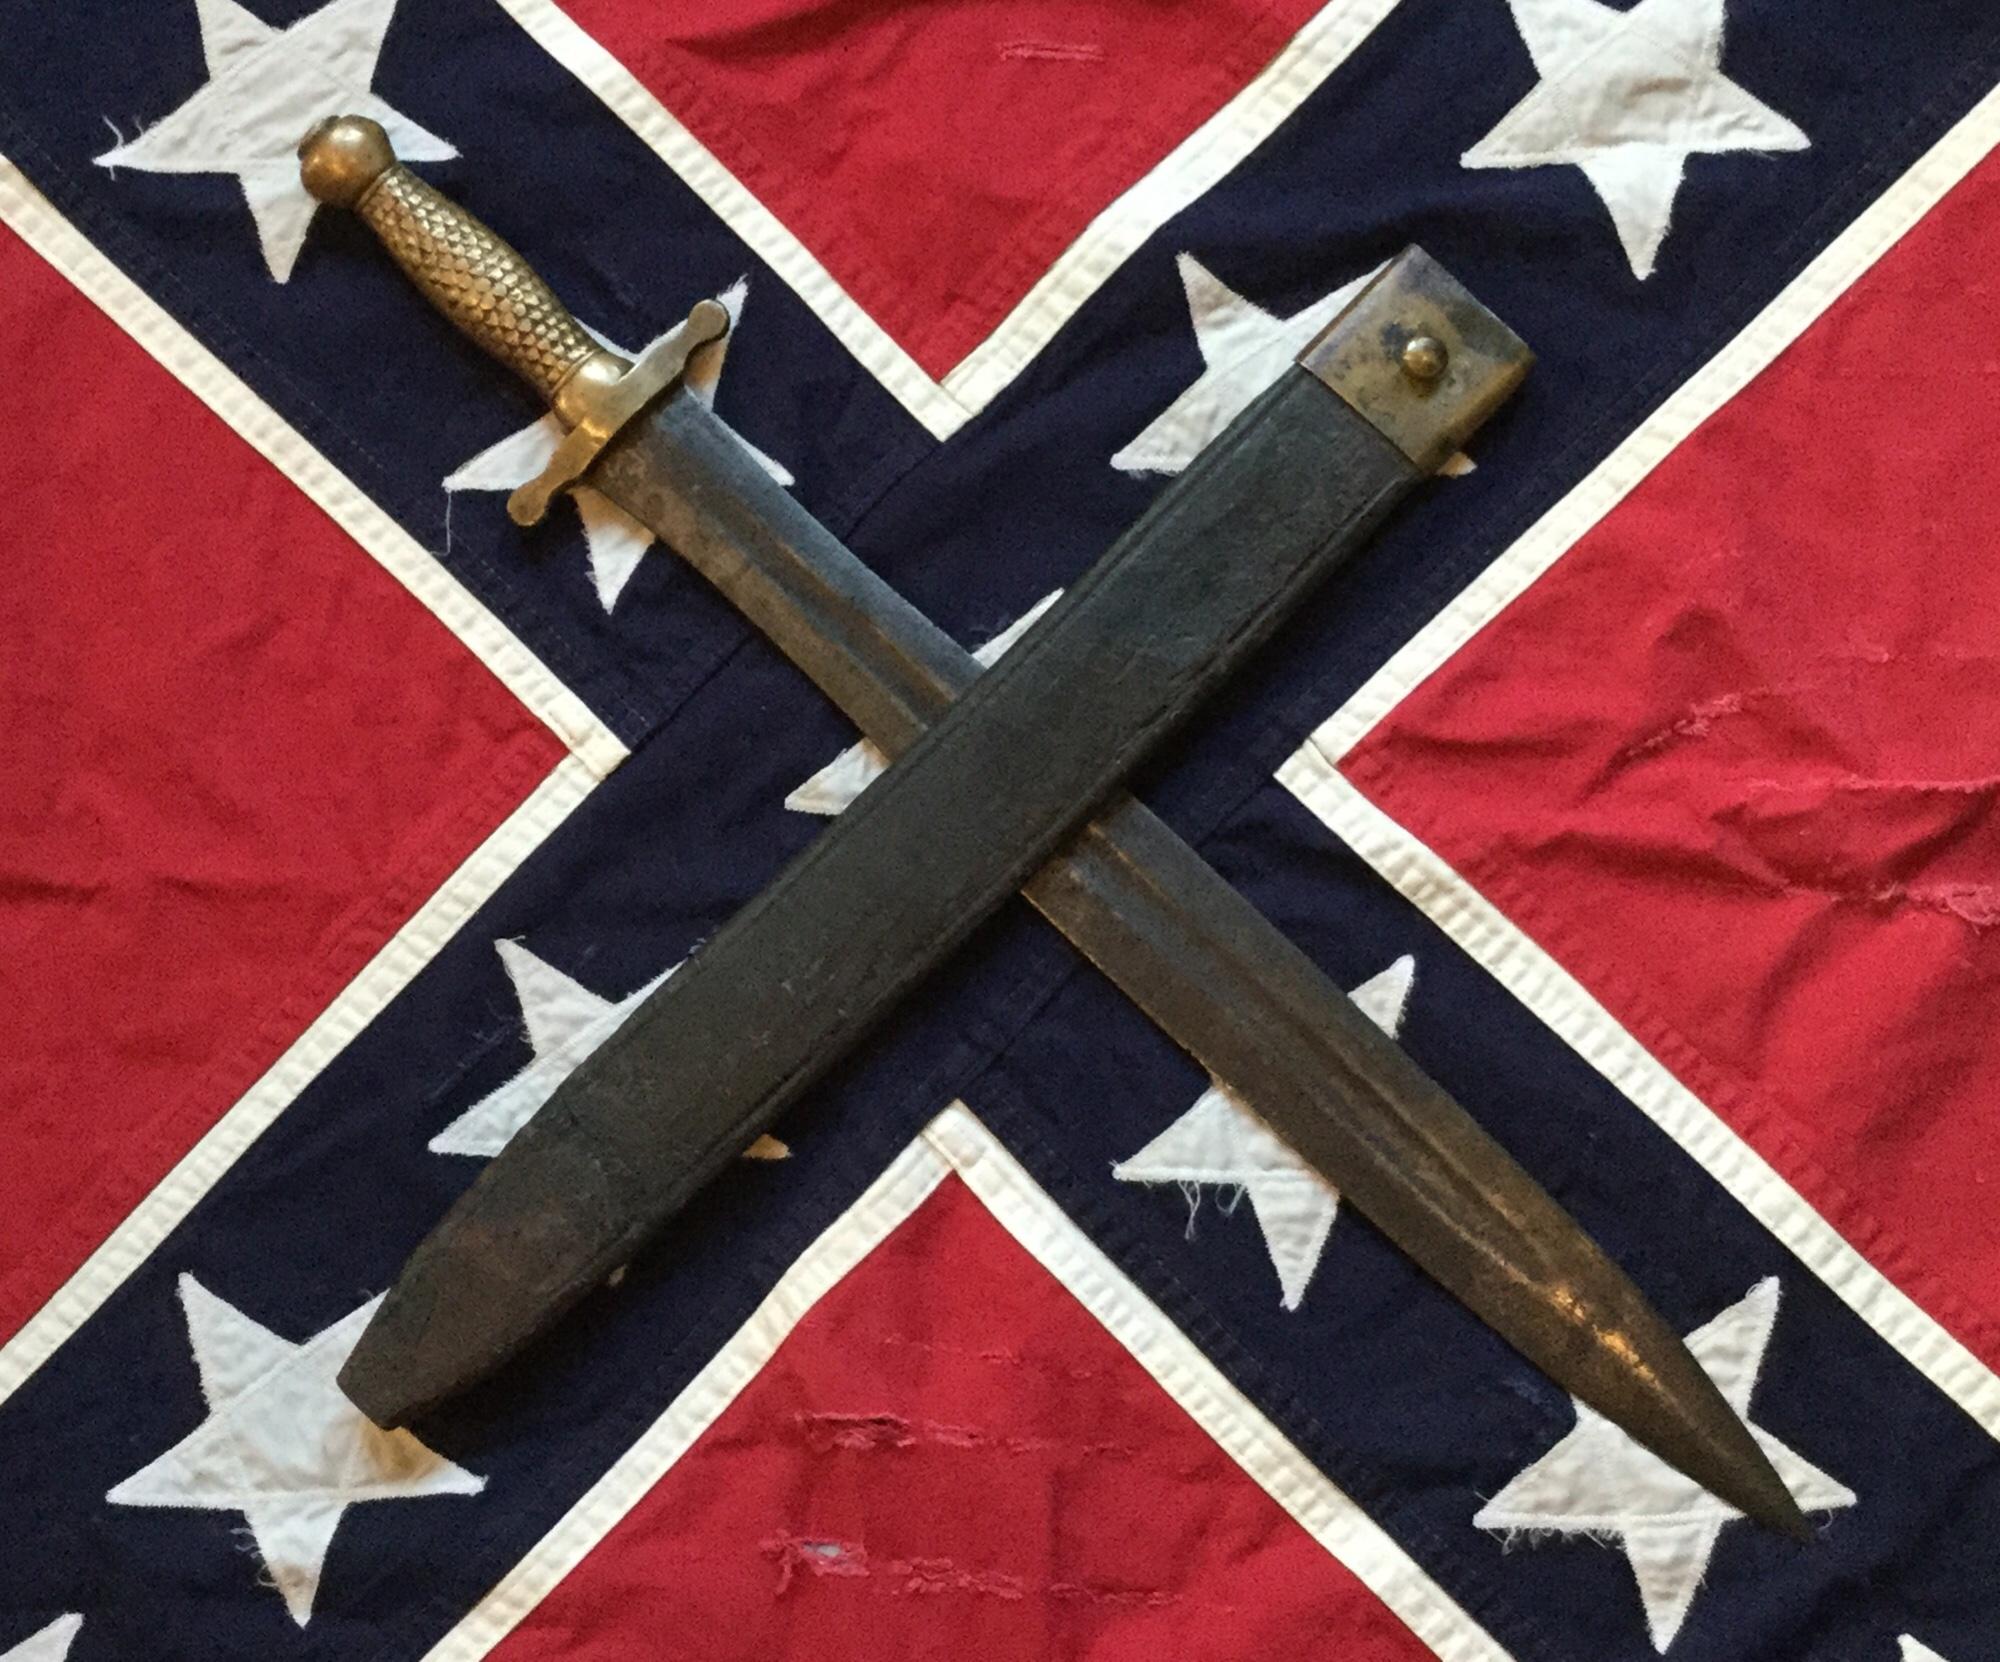 Southern Gladiator Sword & Scabbard